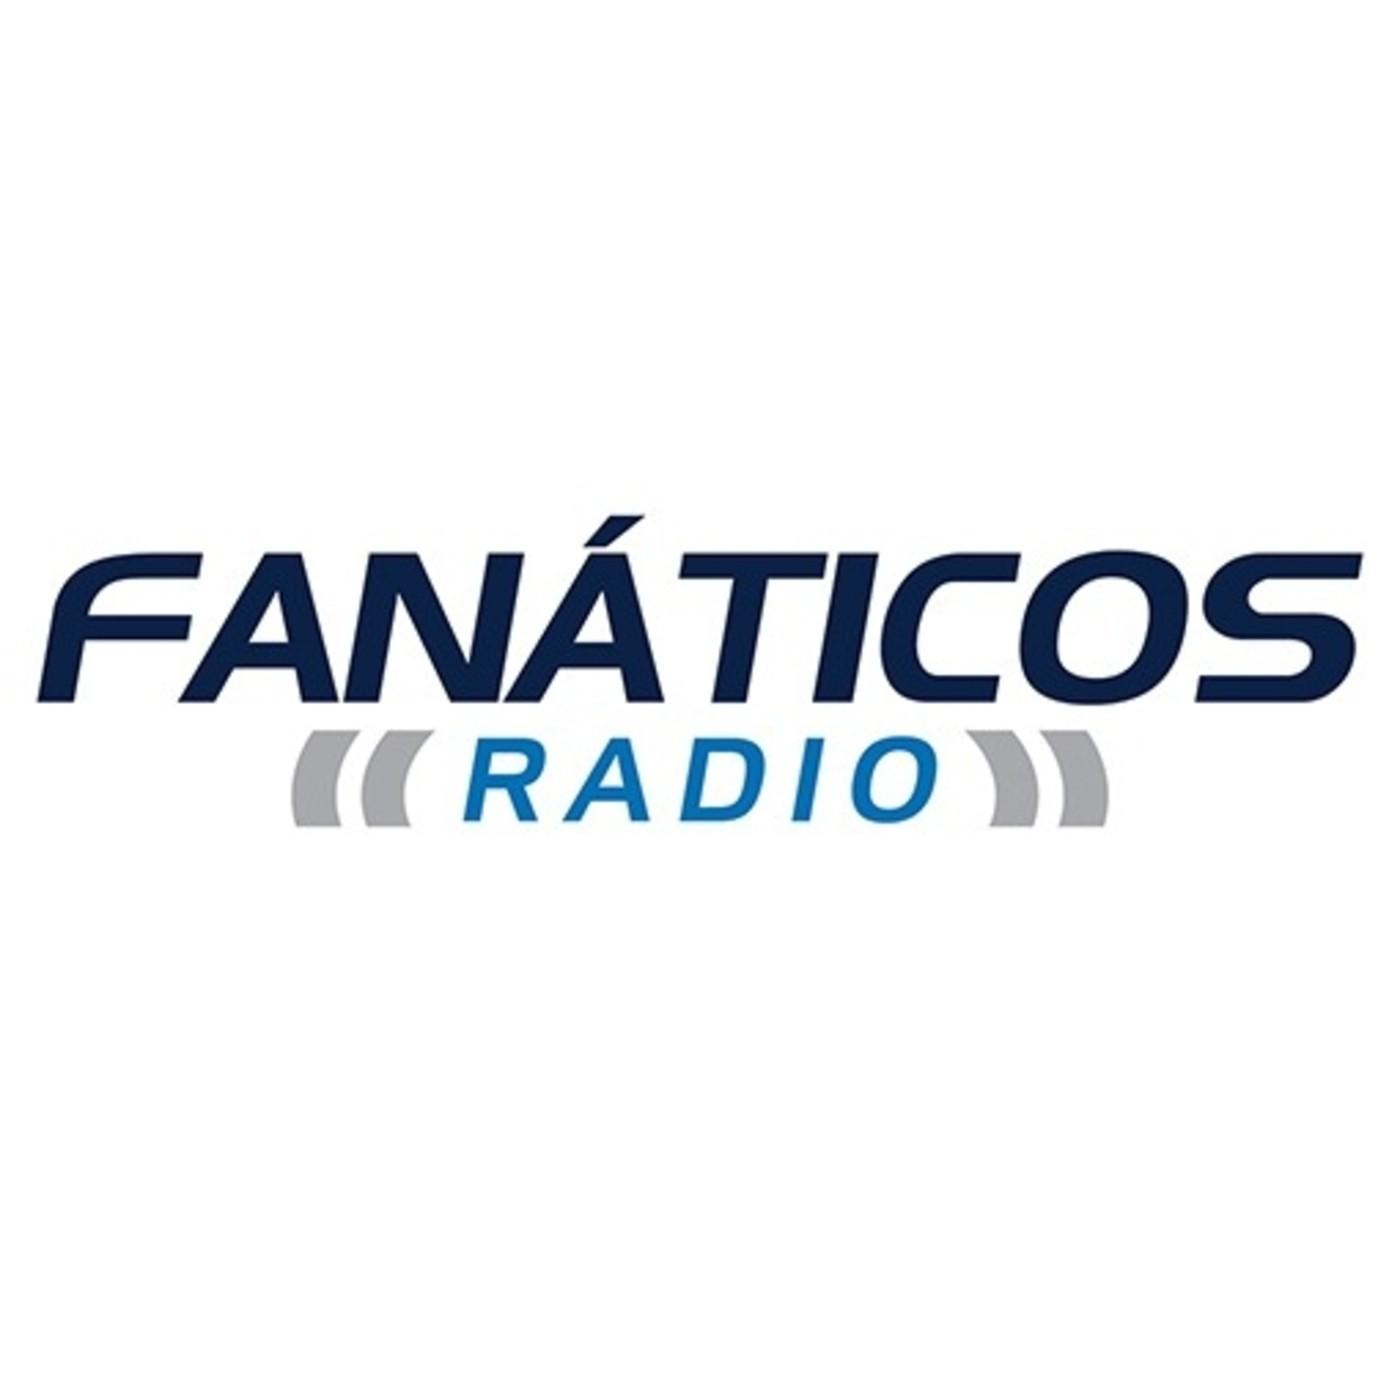 Podcast Fanáticos Radio Mièrcoles 9 de Enero de 2019